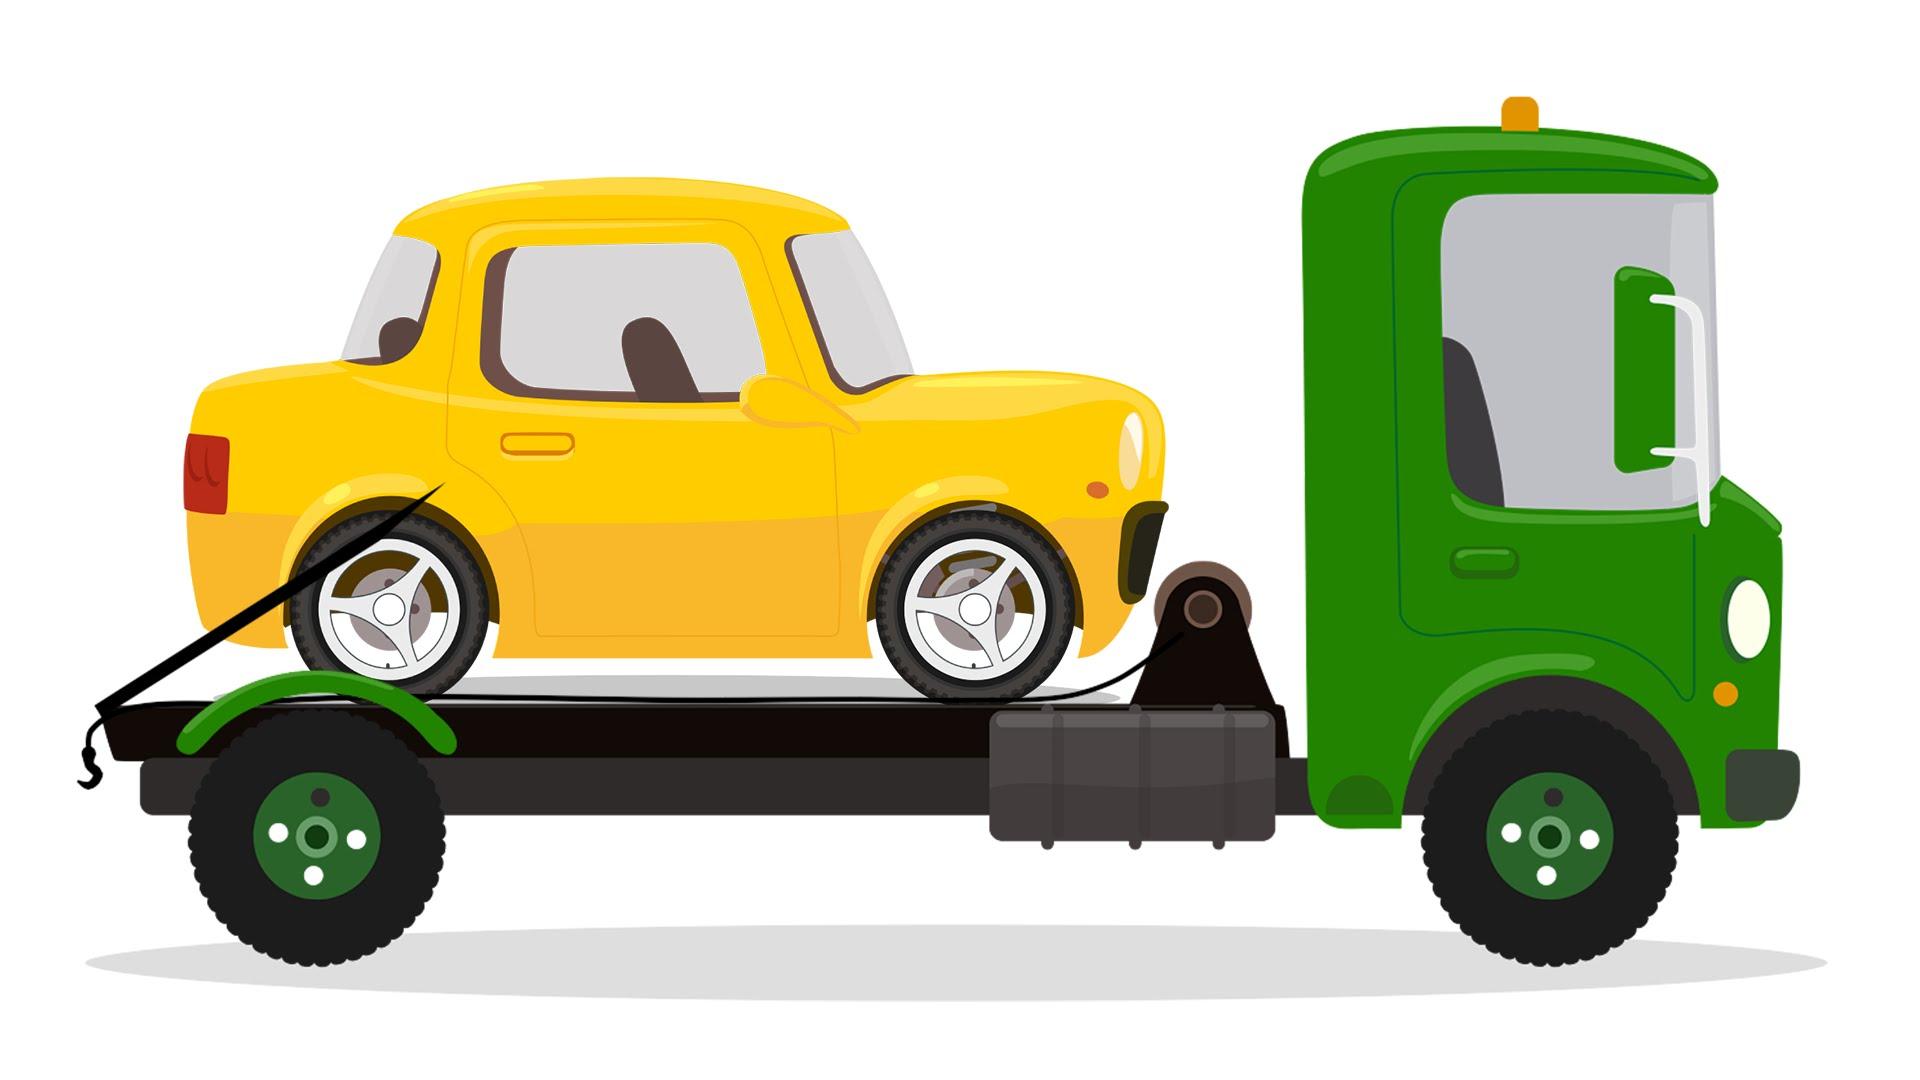 картинки машина без для детей колес